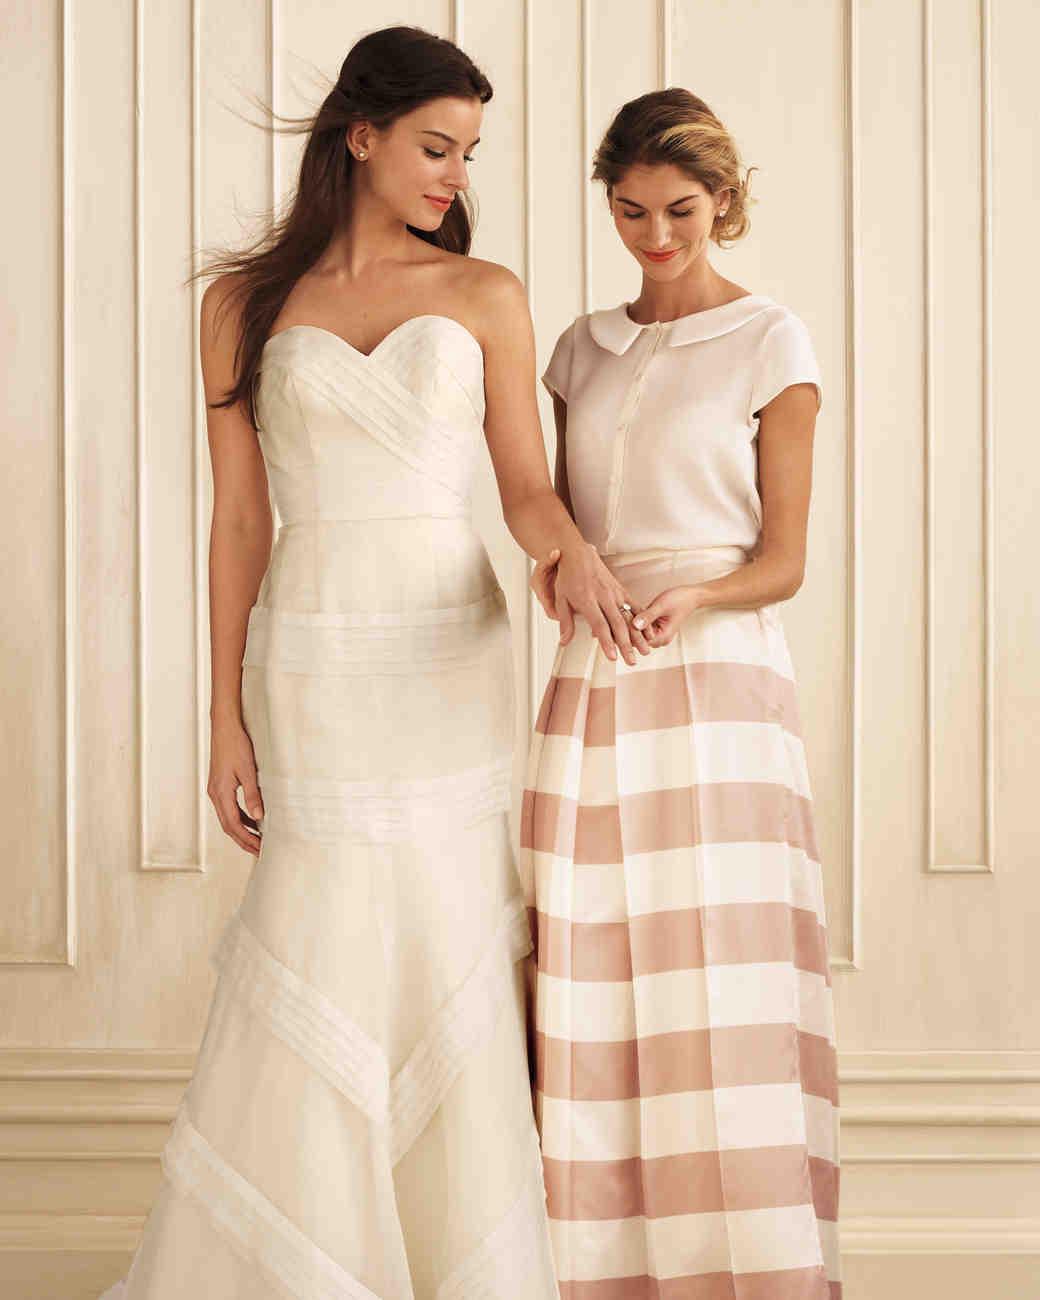 stripes-gowns-dresses-mwd108186.jpg